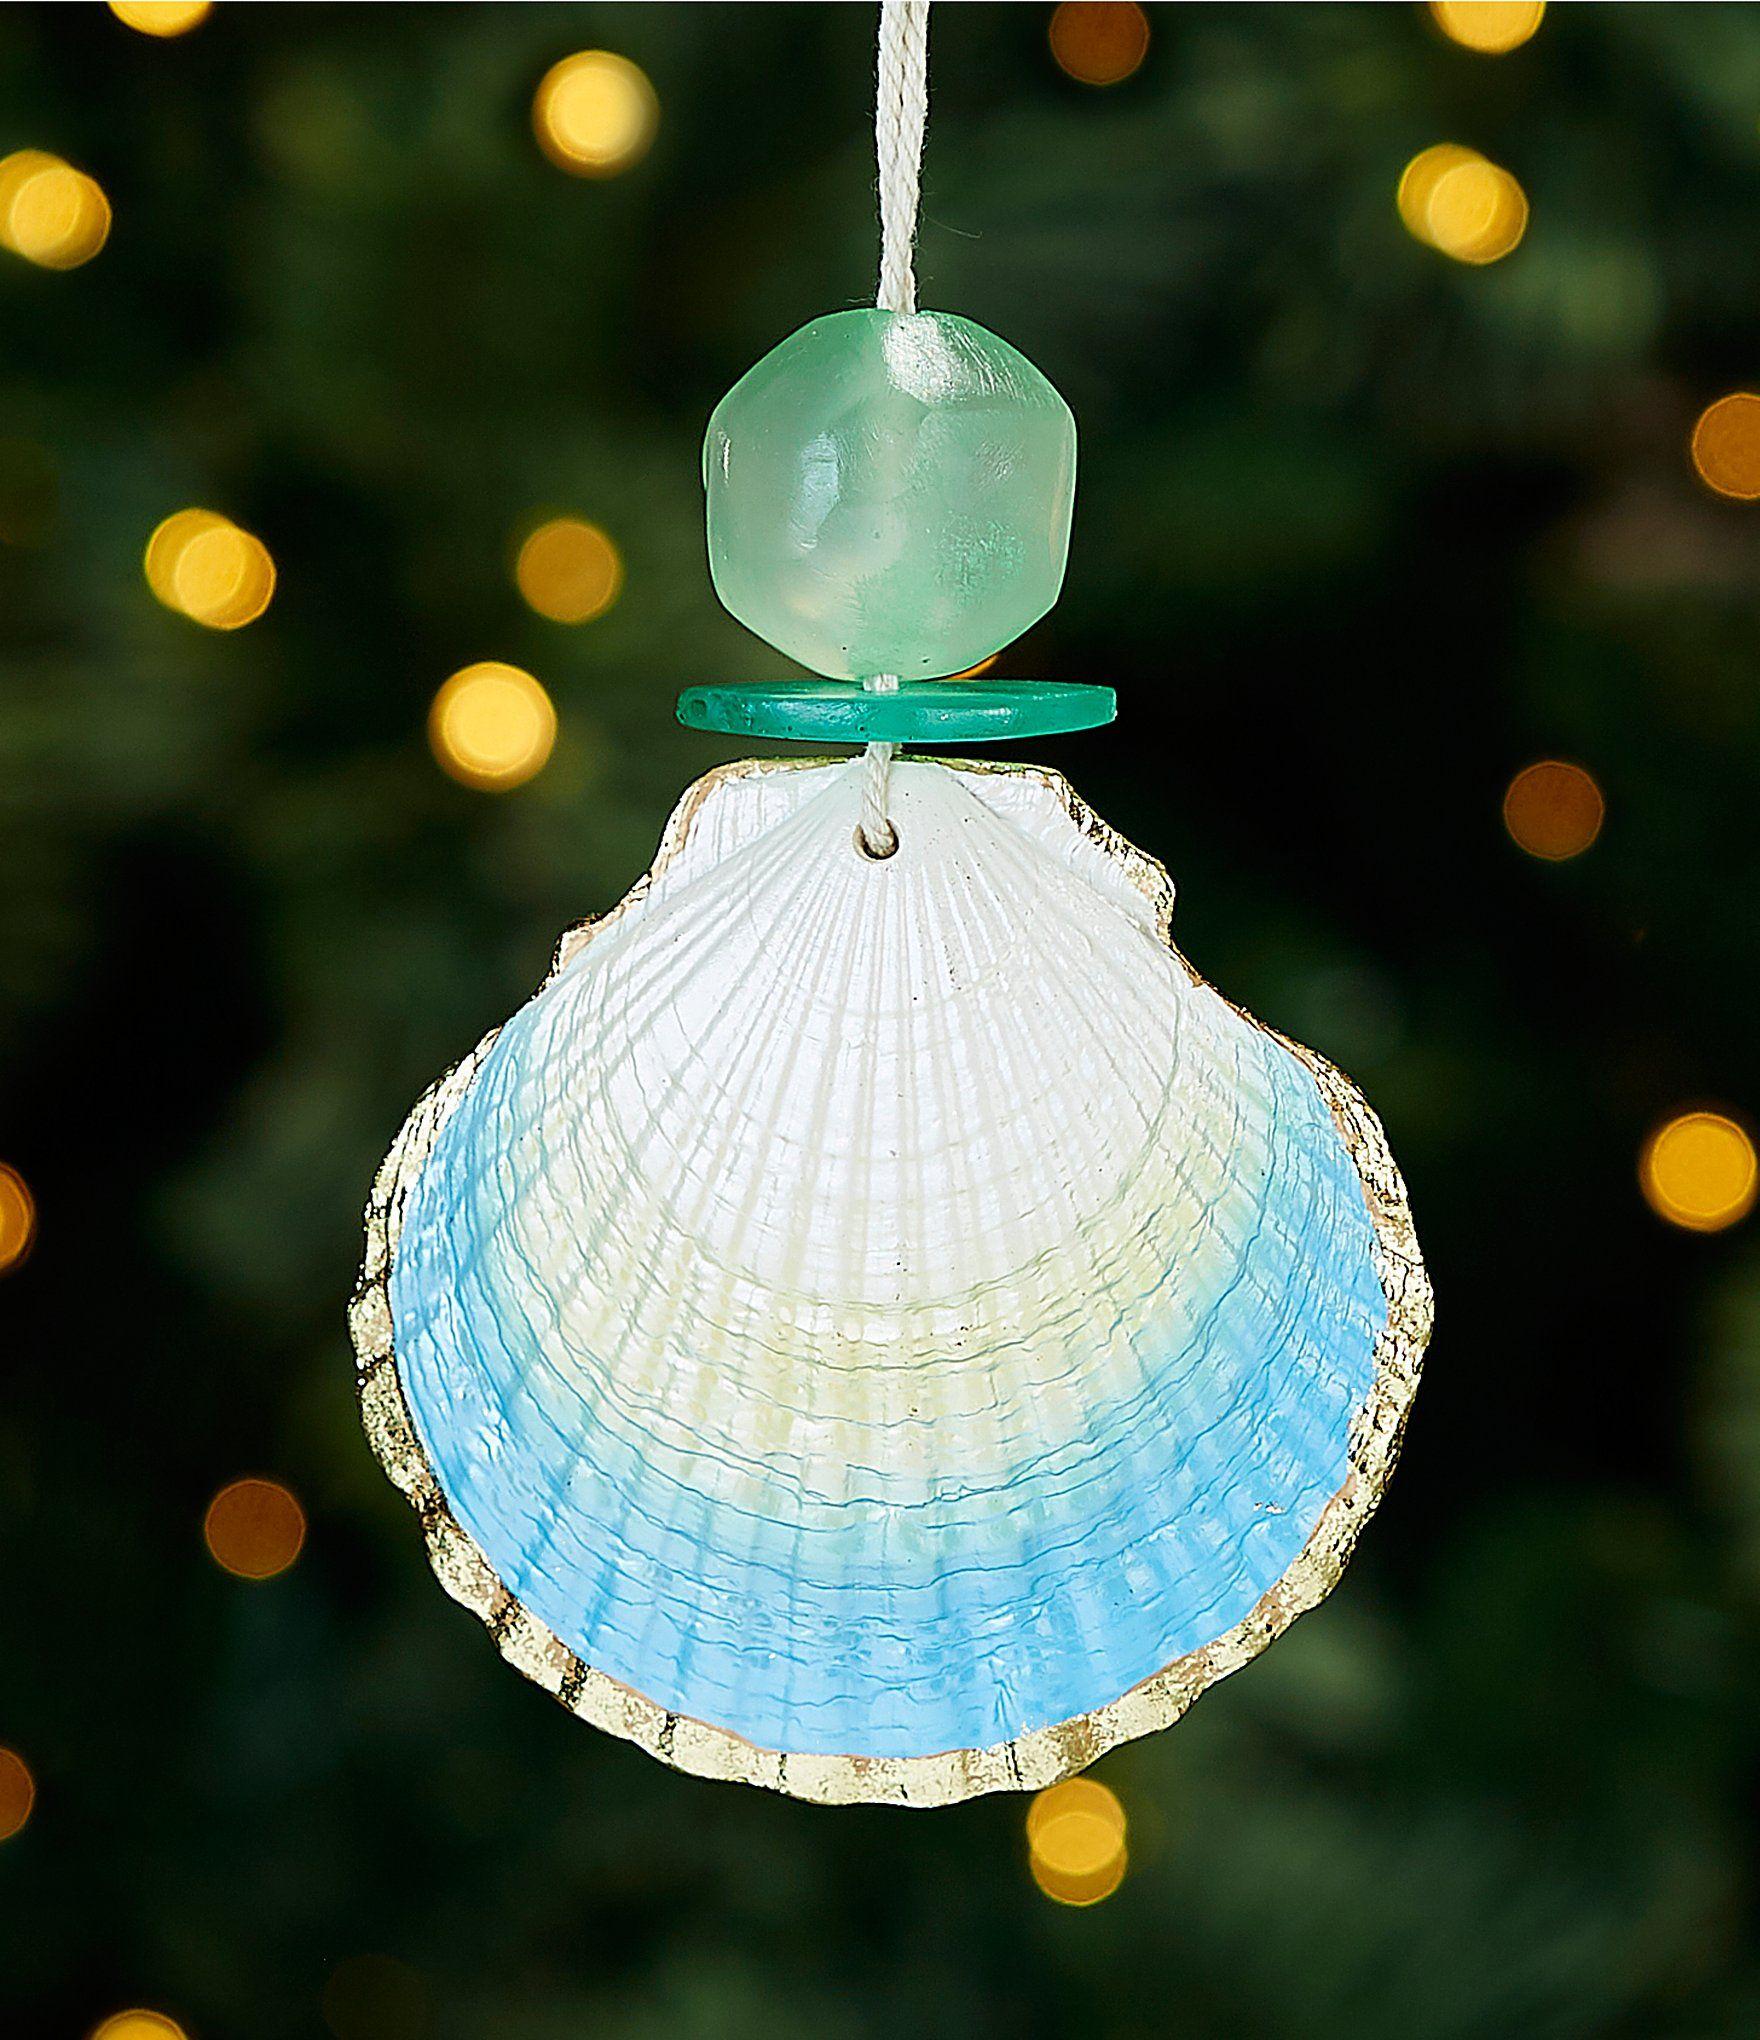 Trimsetter Sea Shells Jingle Bells Clam Shell Ornament Dillard S Shell Ornaments Beach Christmas Decorations Ornaments